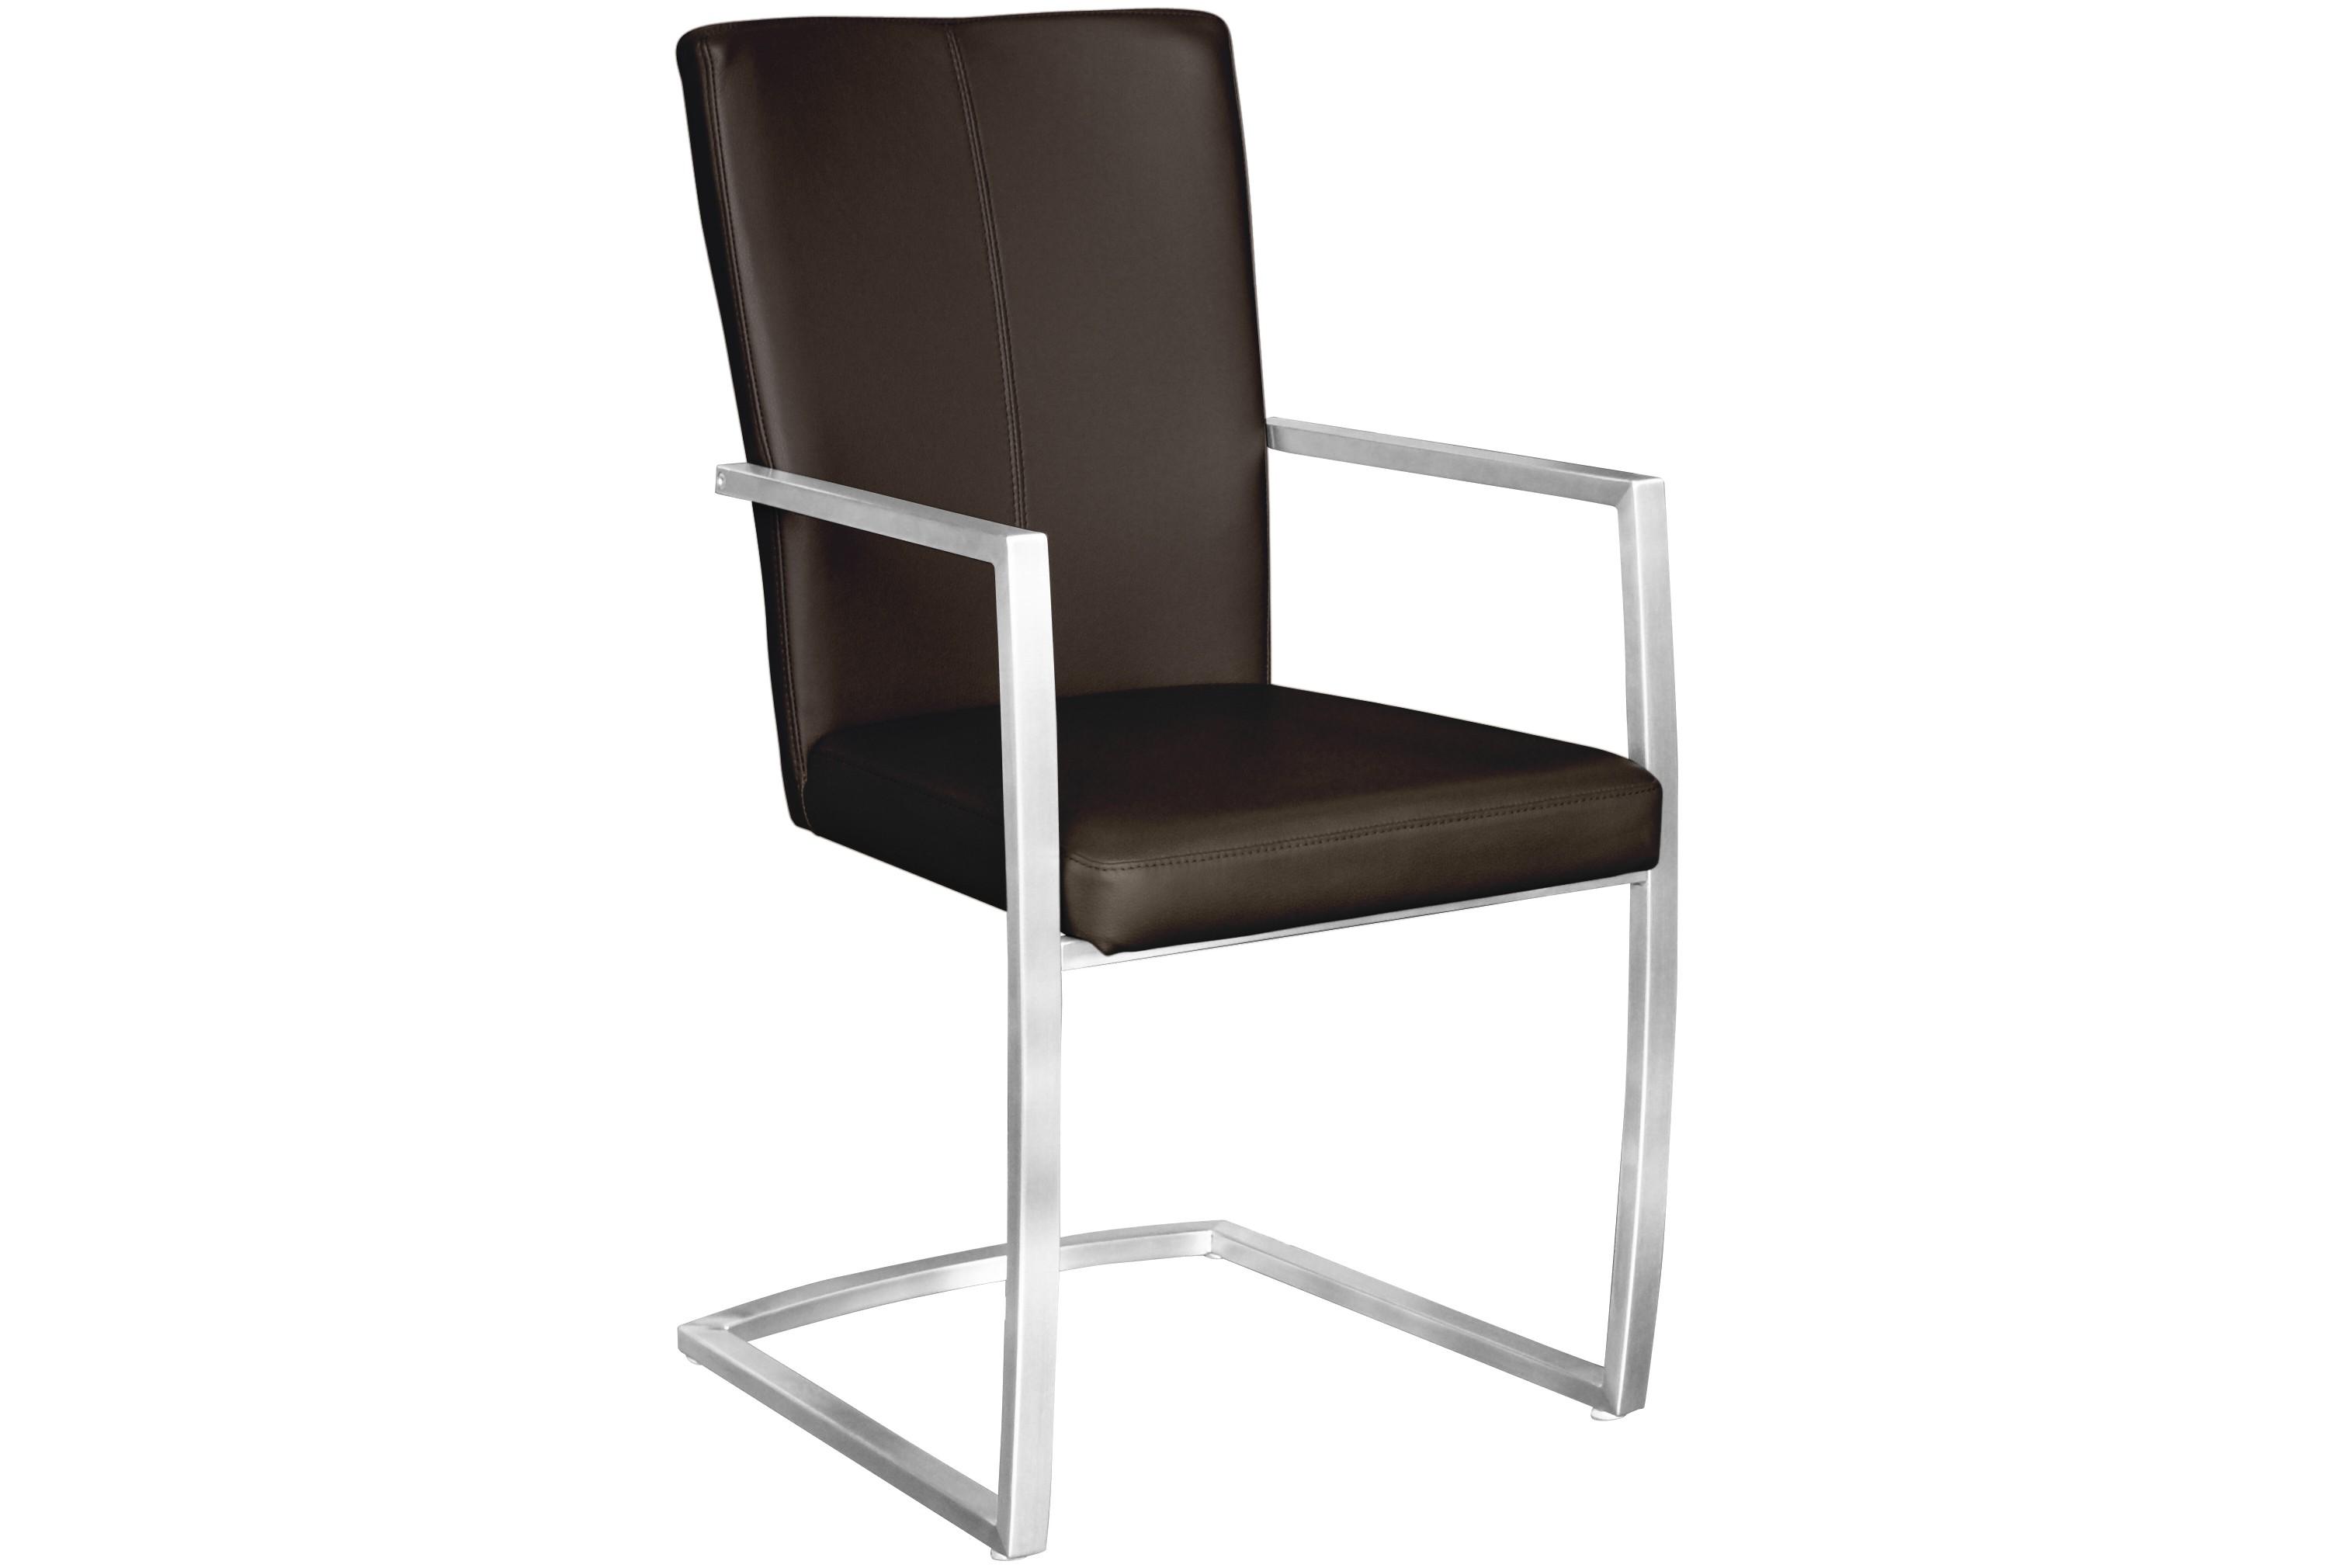 Badezimmer Stuhl Modern | Esszimmerstühle Leder Badezimmer ...